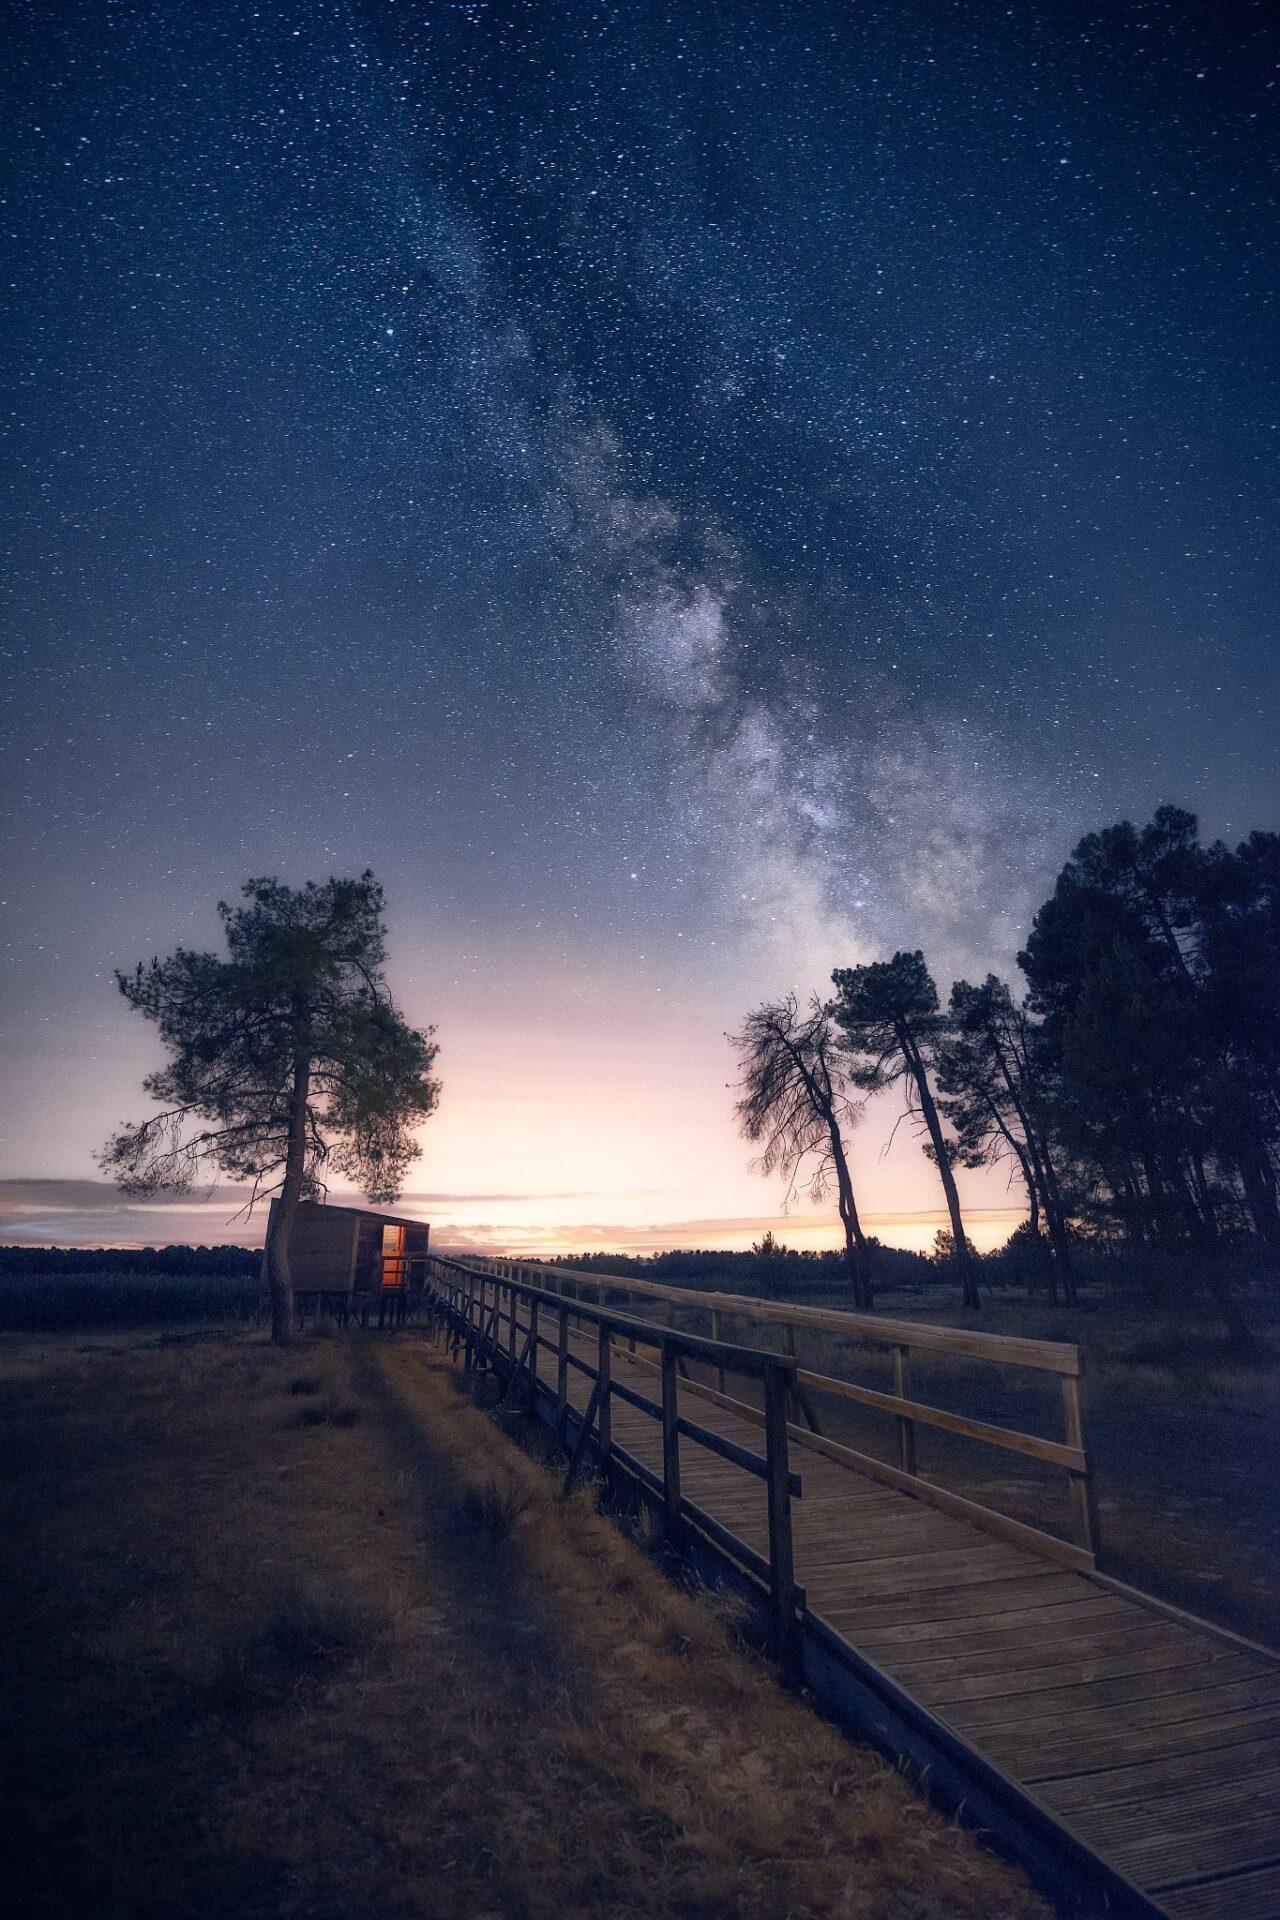 Fotografía nocturna. Javier Rosano